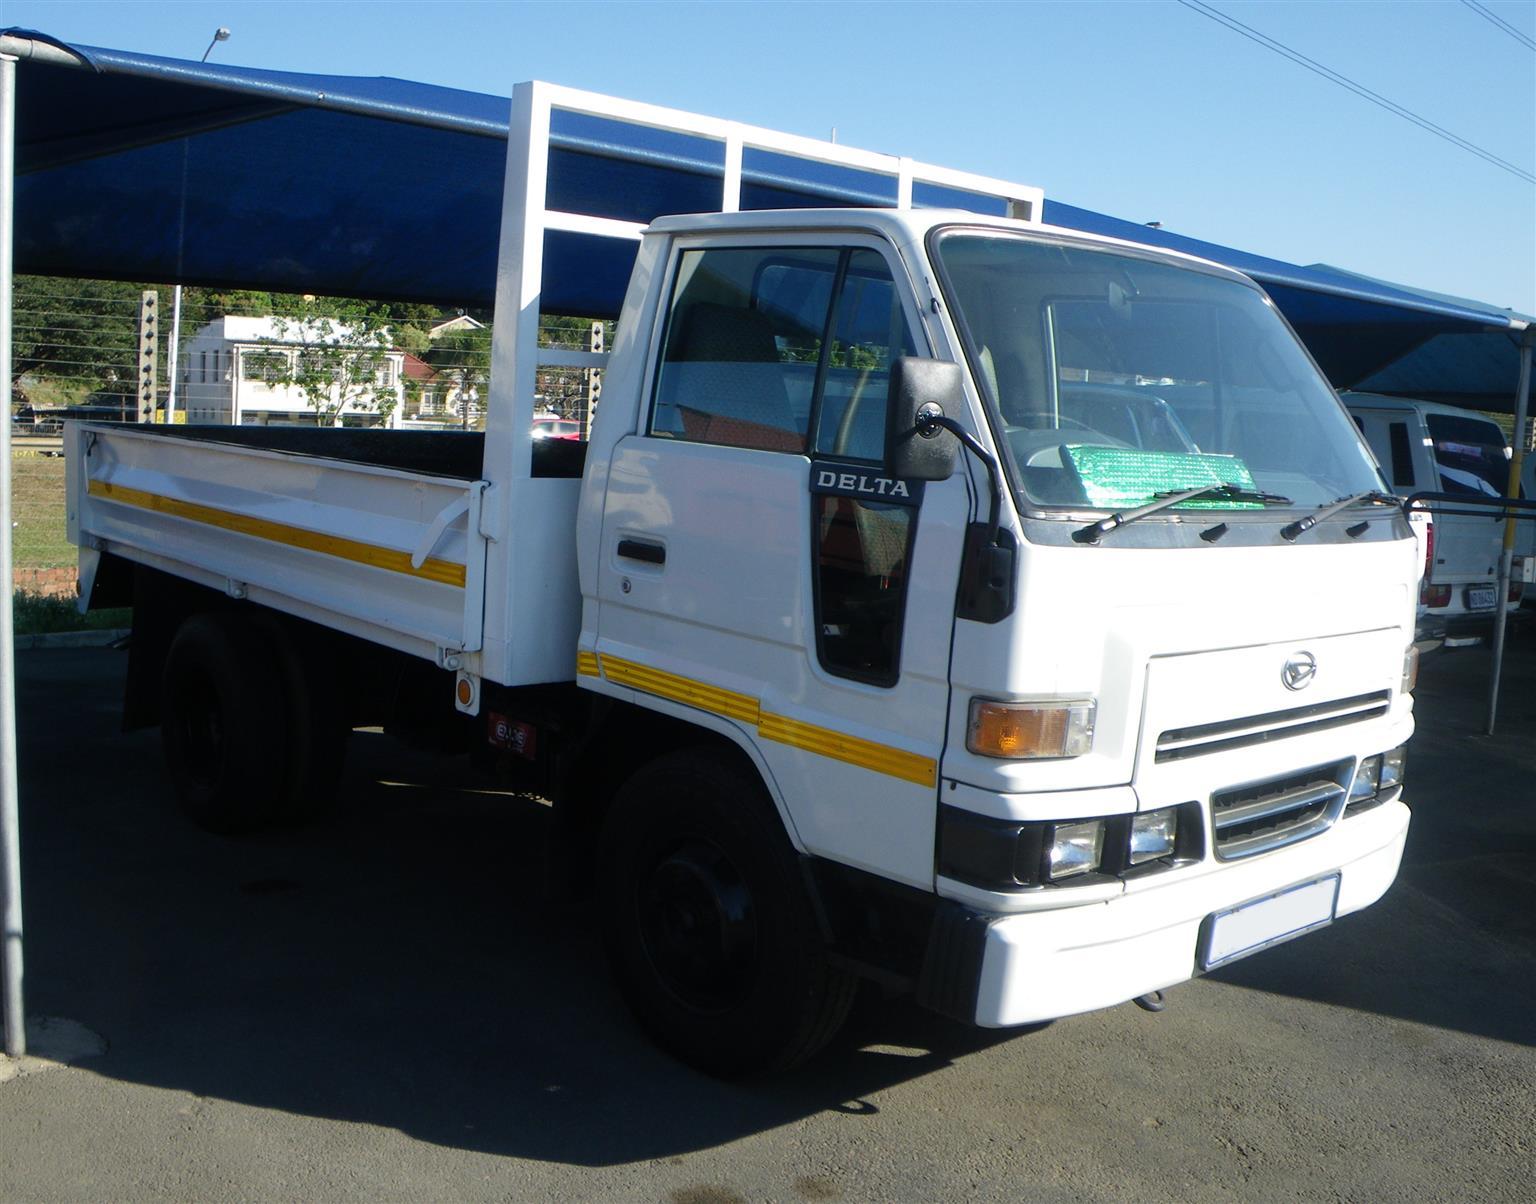 2.5ton Daihatsu Delta used dropside truck - AA2385